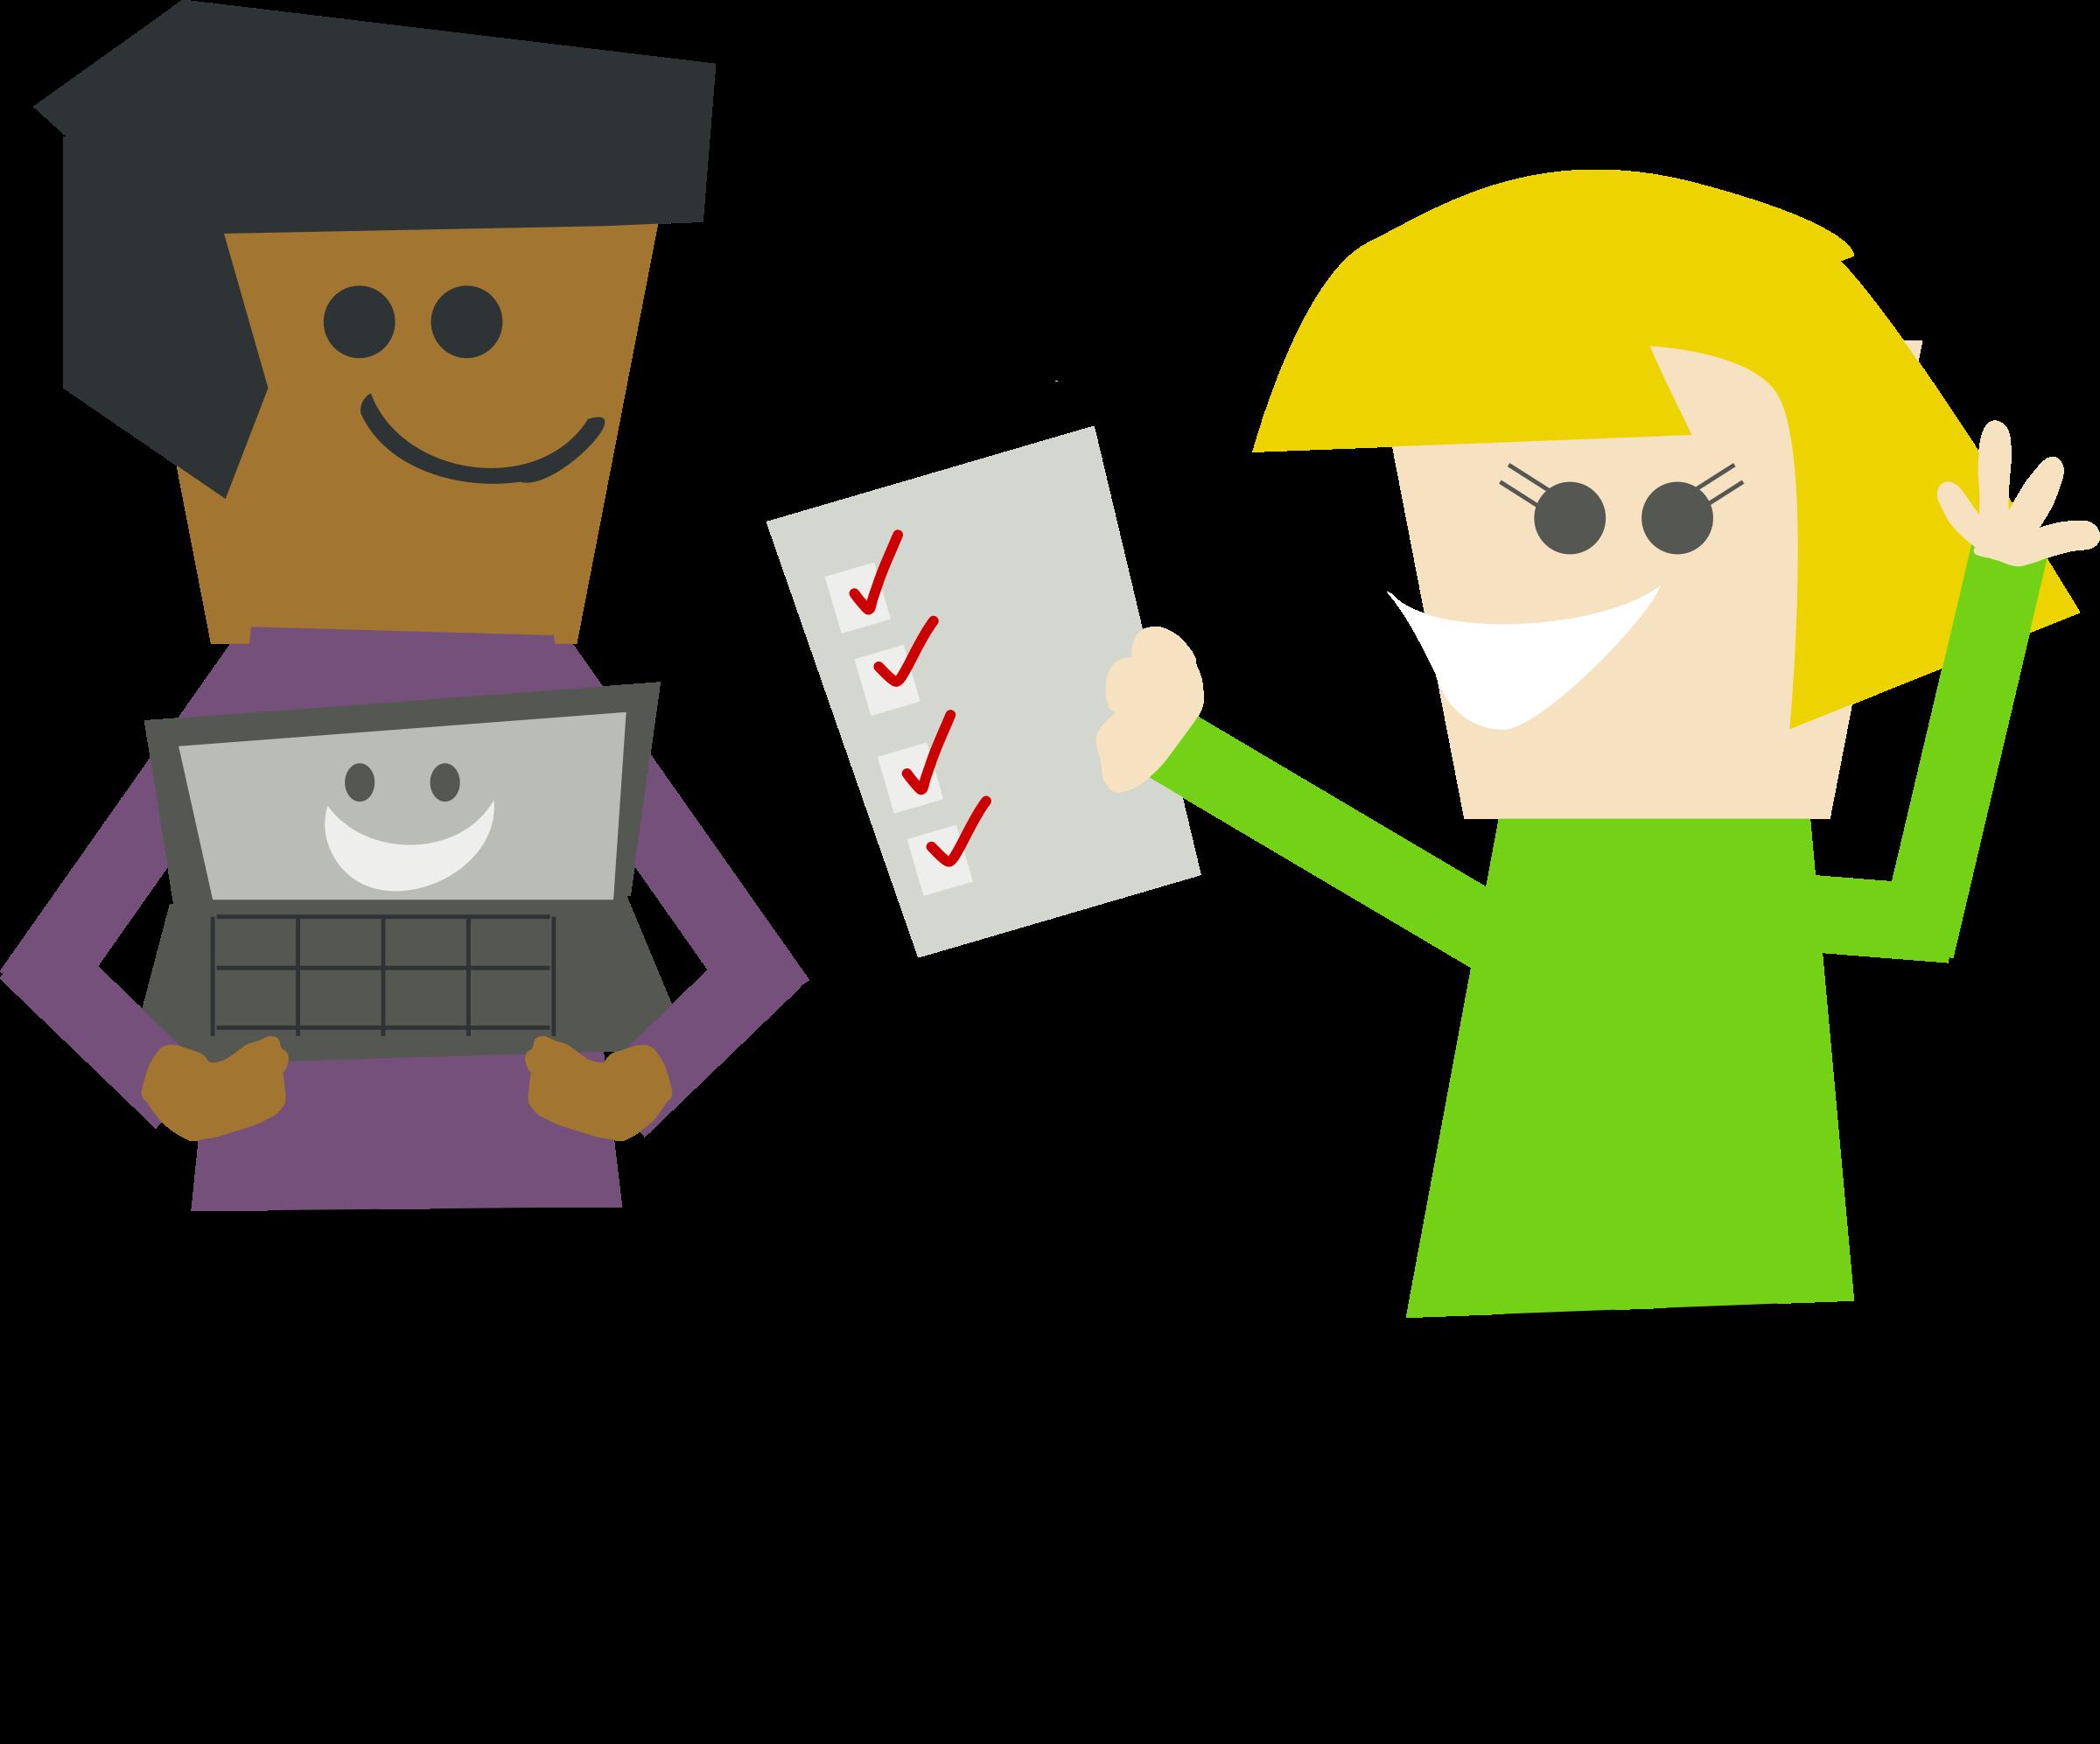 Graduate profile nusd the. Collaboration clipart interpersonal relationship